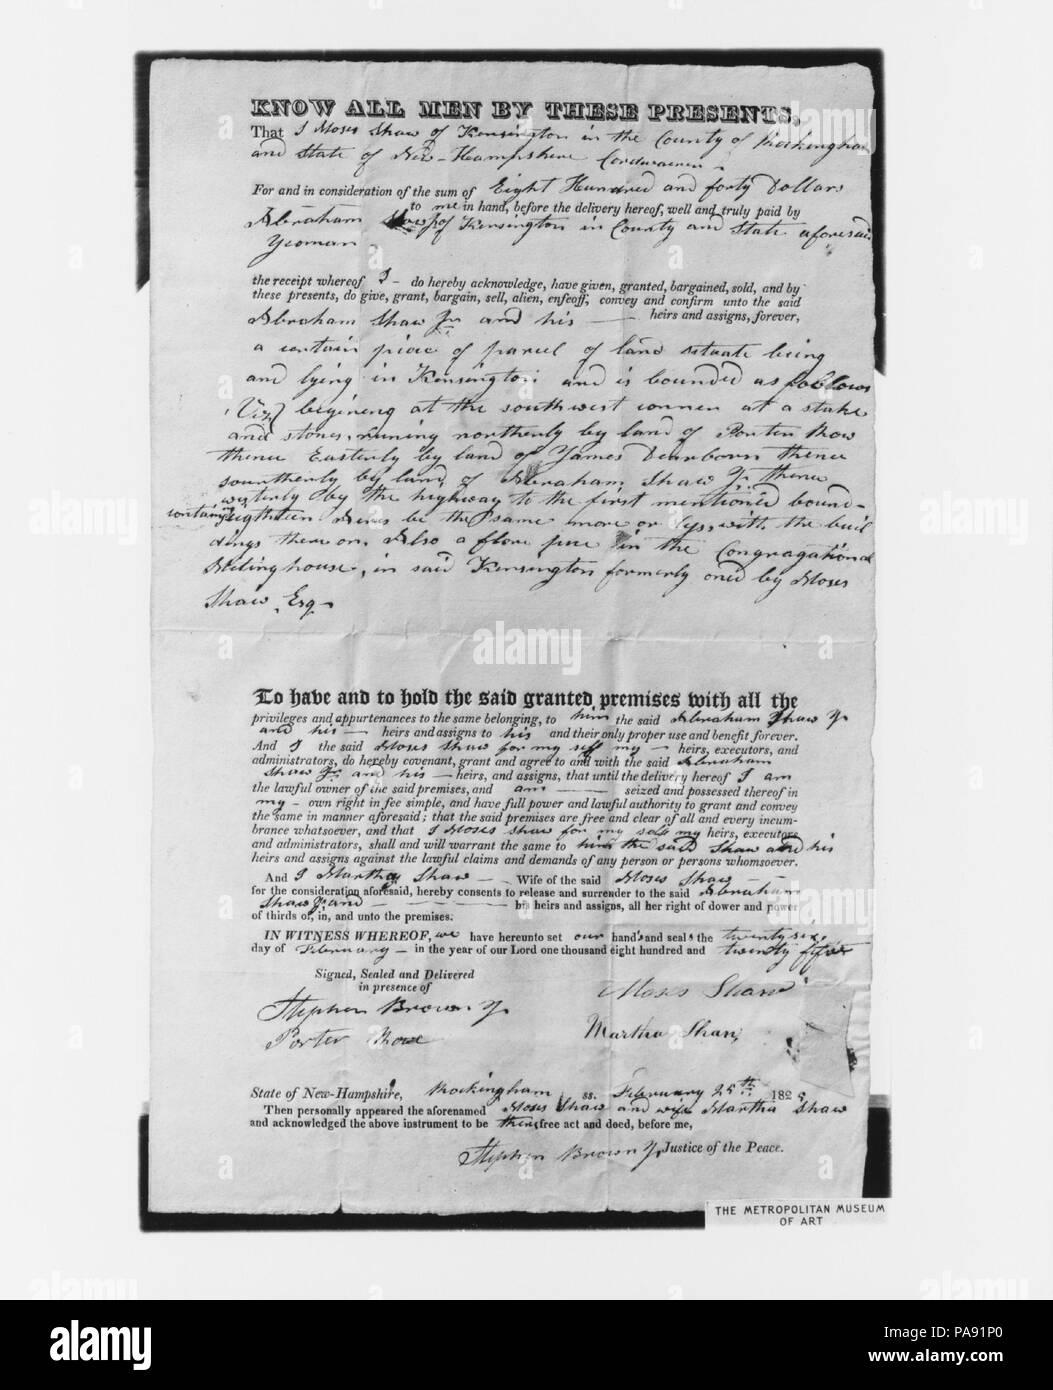 Manuscript Deed for Shaw Homestead, Kensington, New